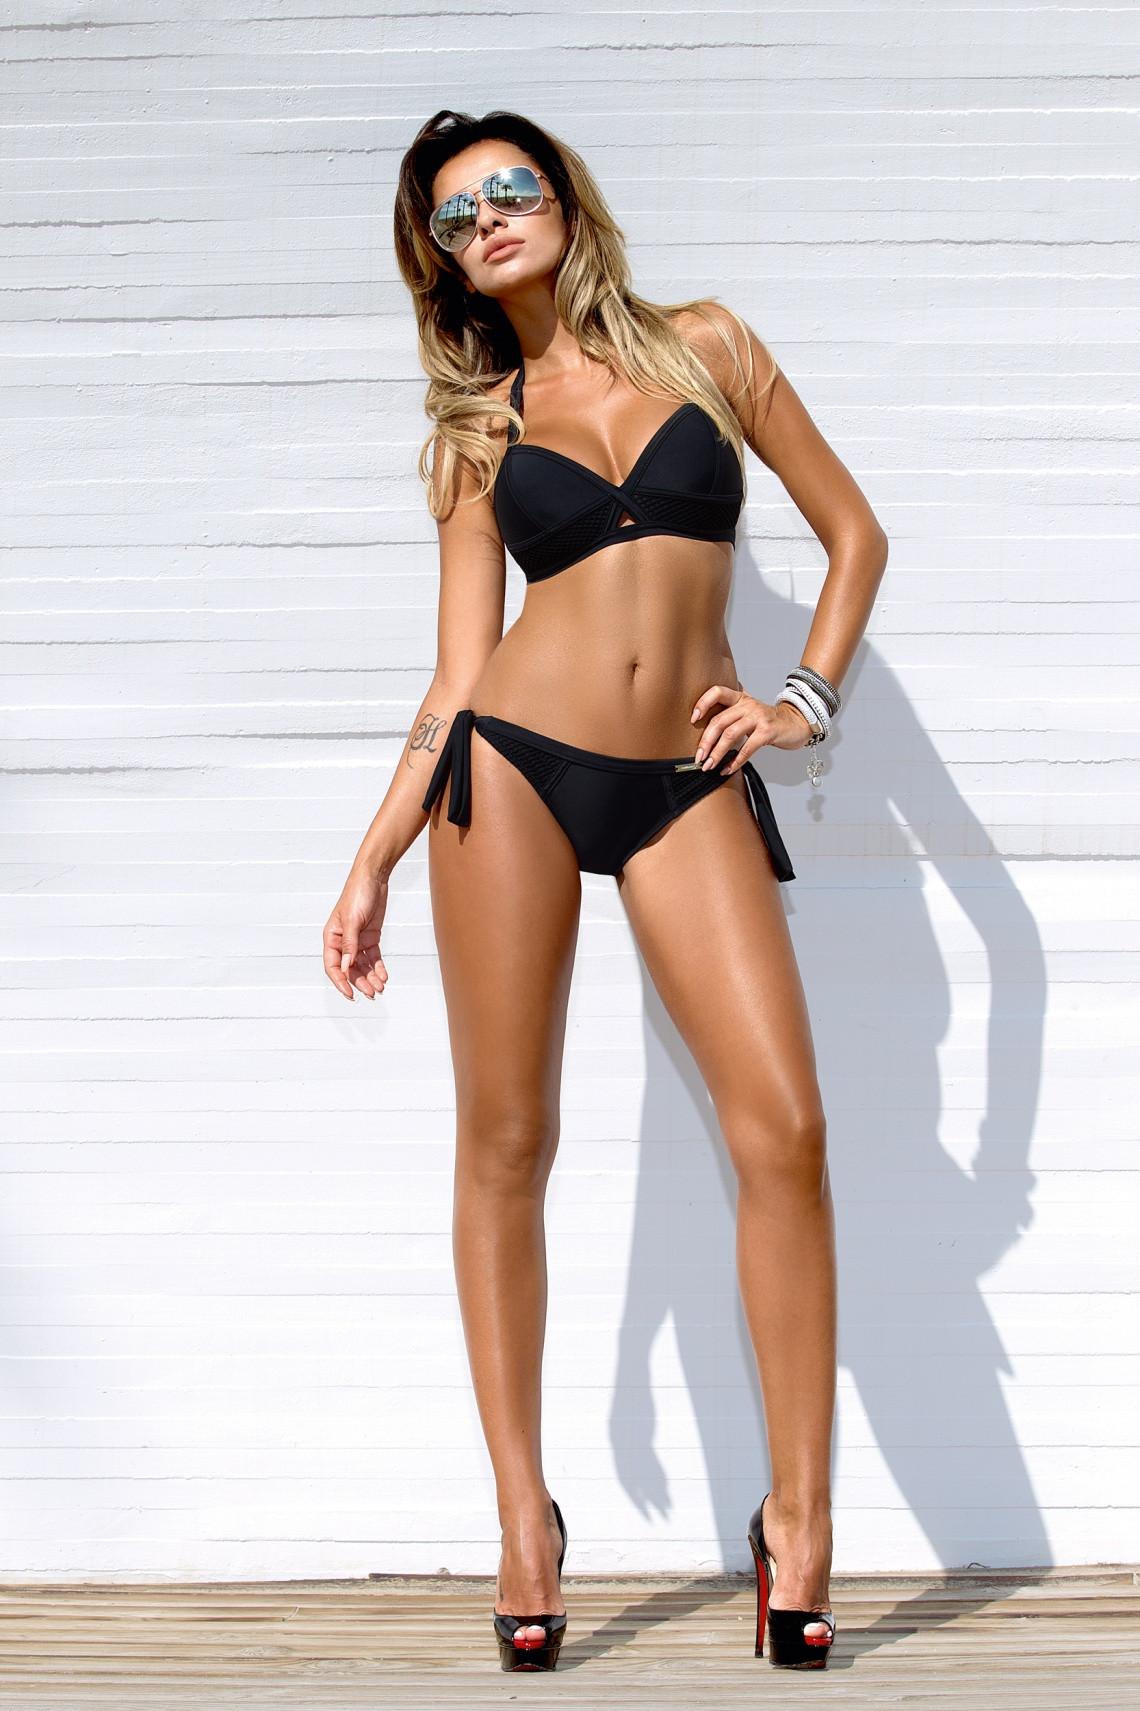 Dámské dvoudílné plavky Gabbiano Gaby 04 Barva: černá, Velikost: 38